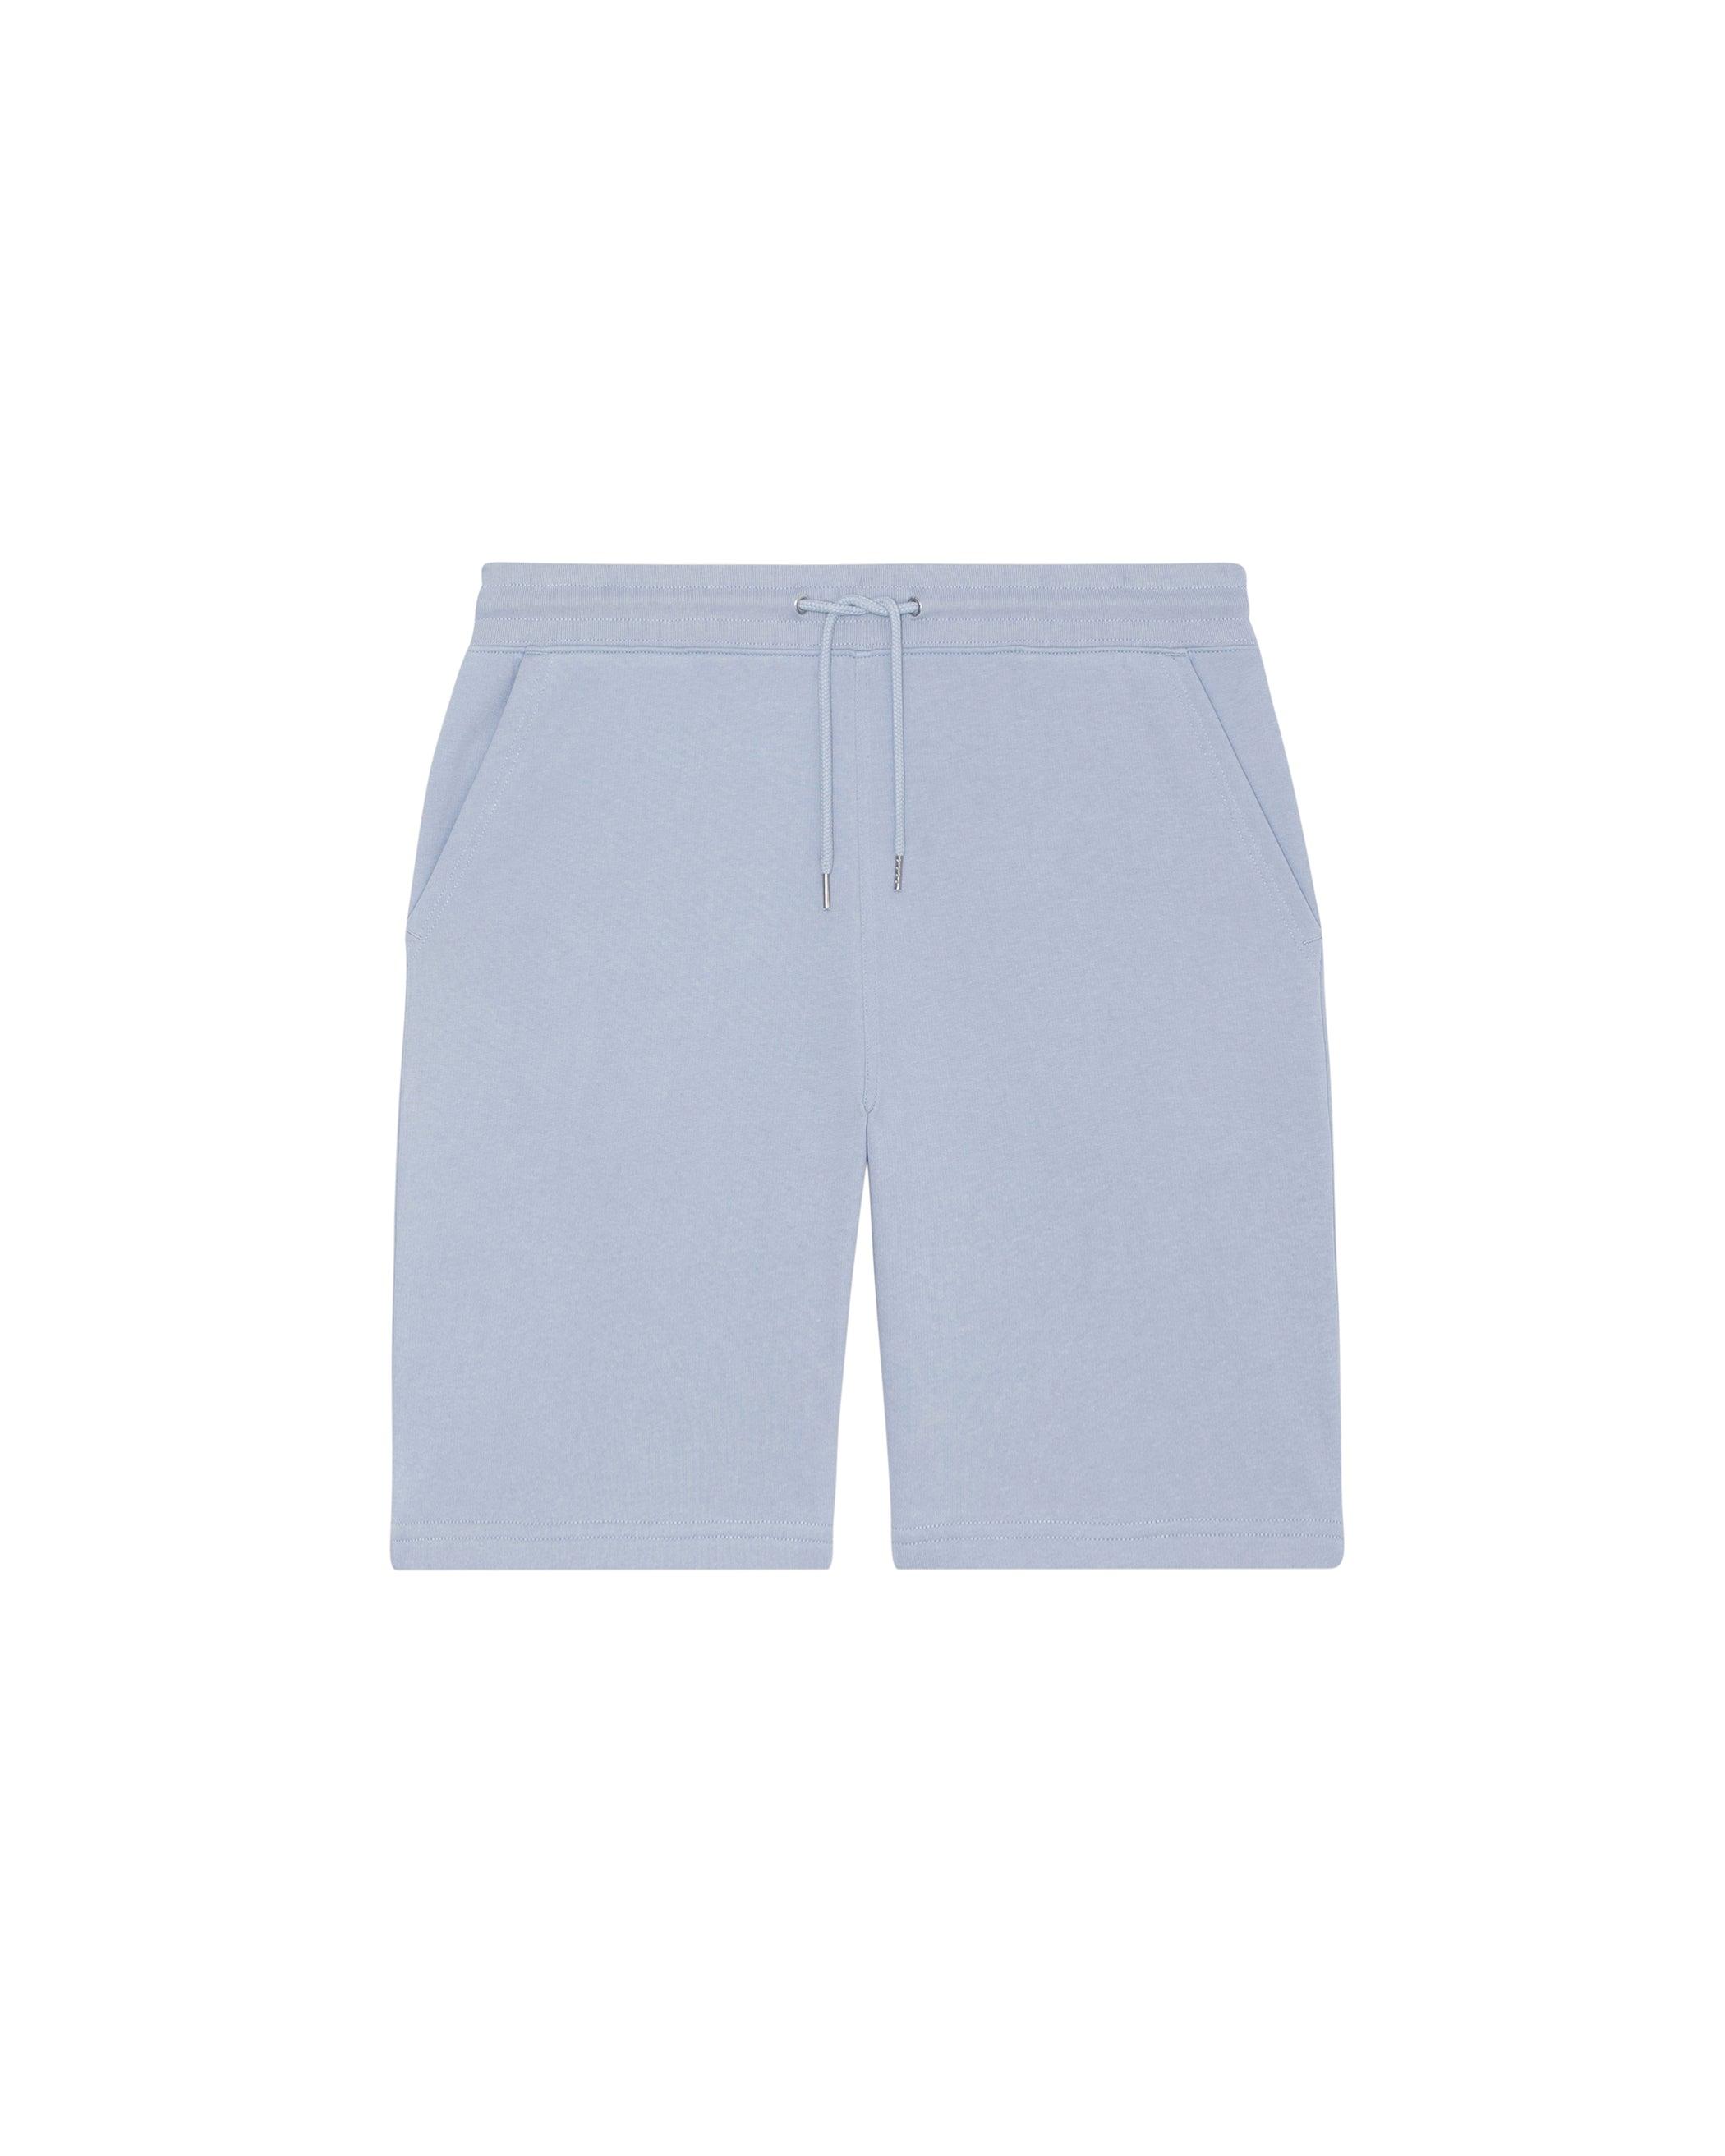 Savi Track Shorts Light Blue